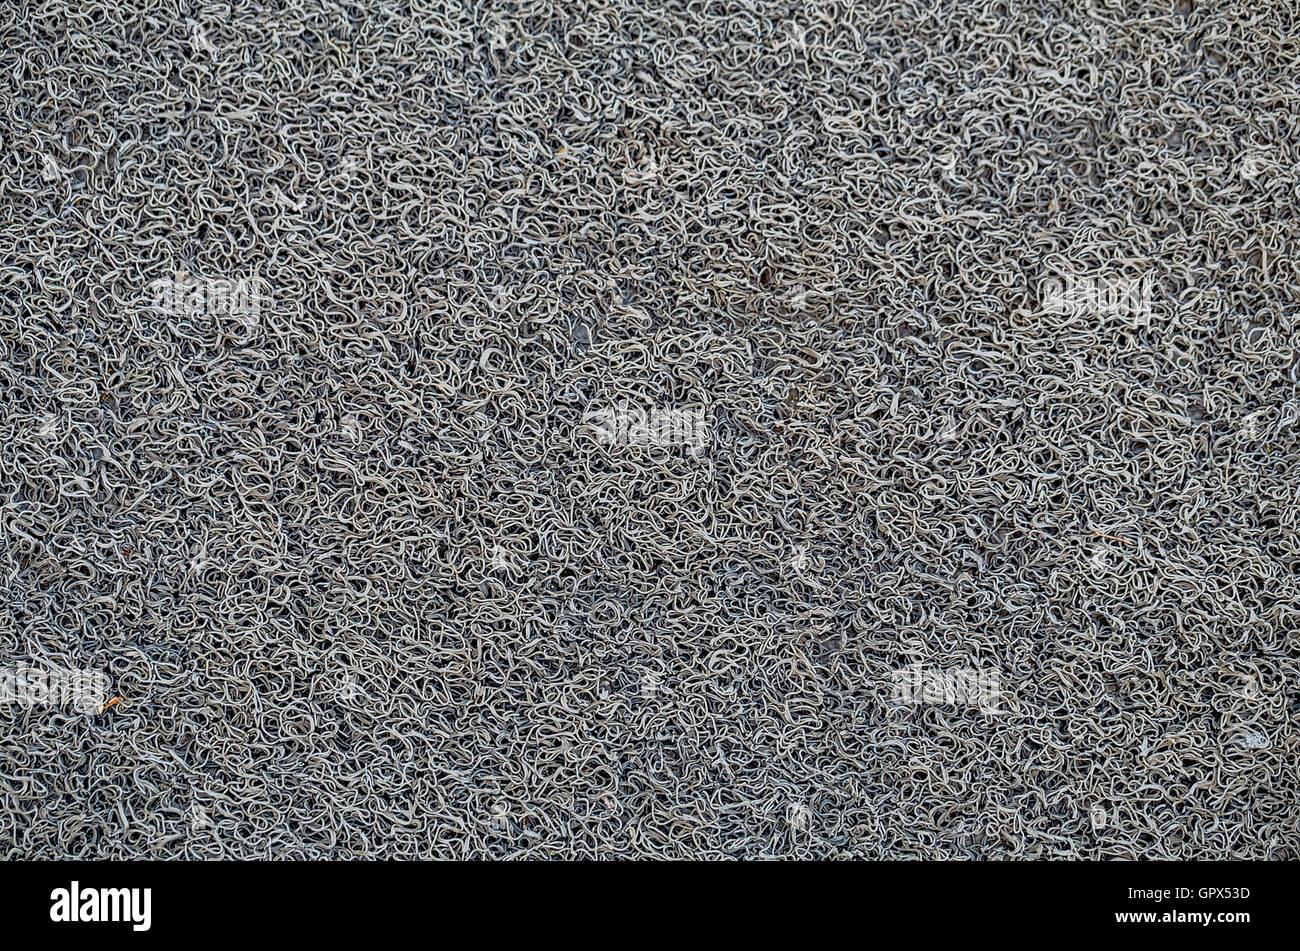 Pvc Texture Stock Photos Amp Pvc Texture Stock Images Alamy